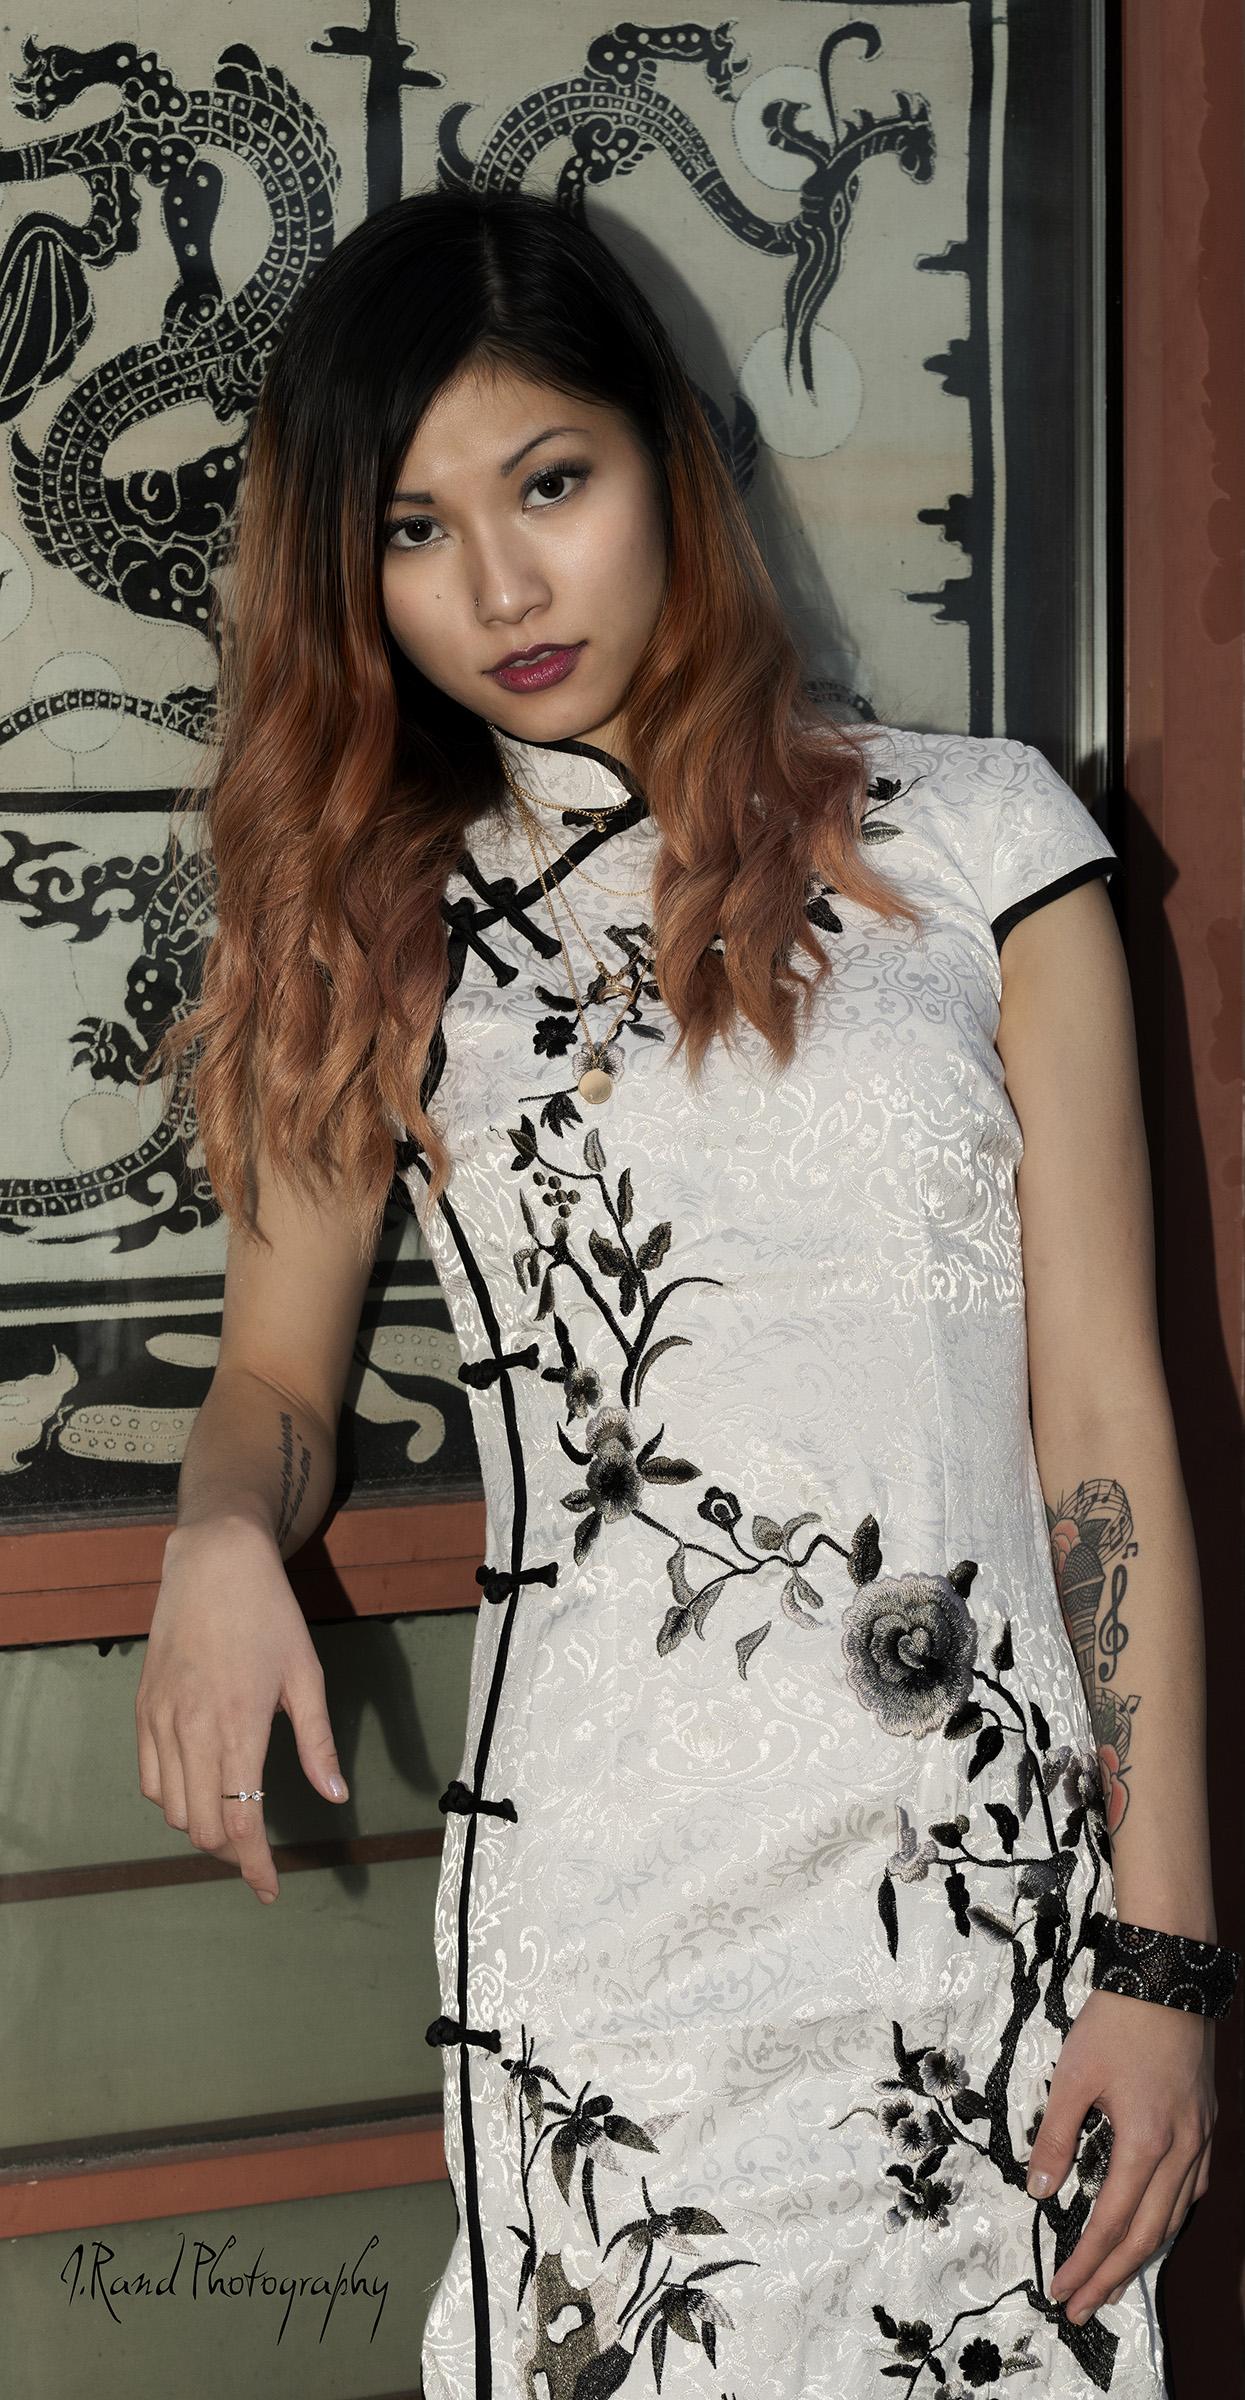 IG KelseyLuo Vancouver Model/ Musician